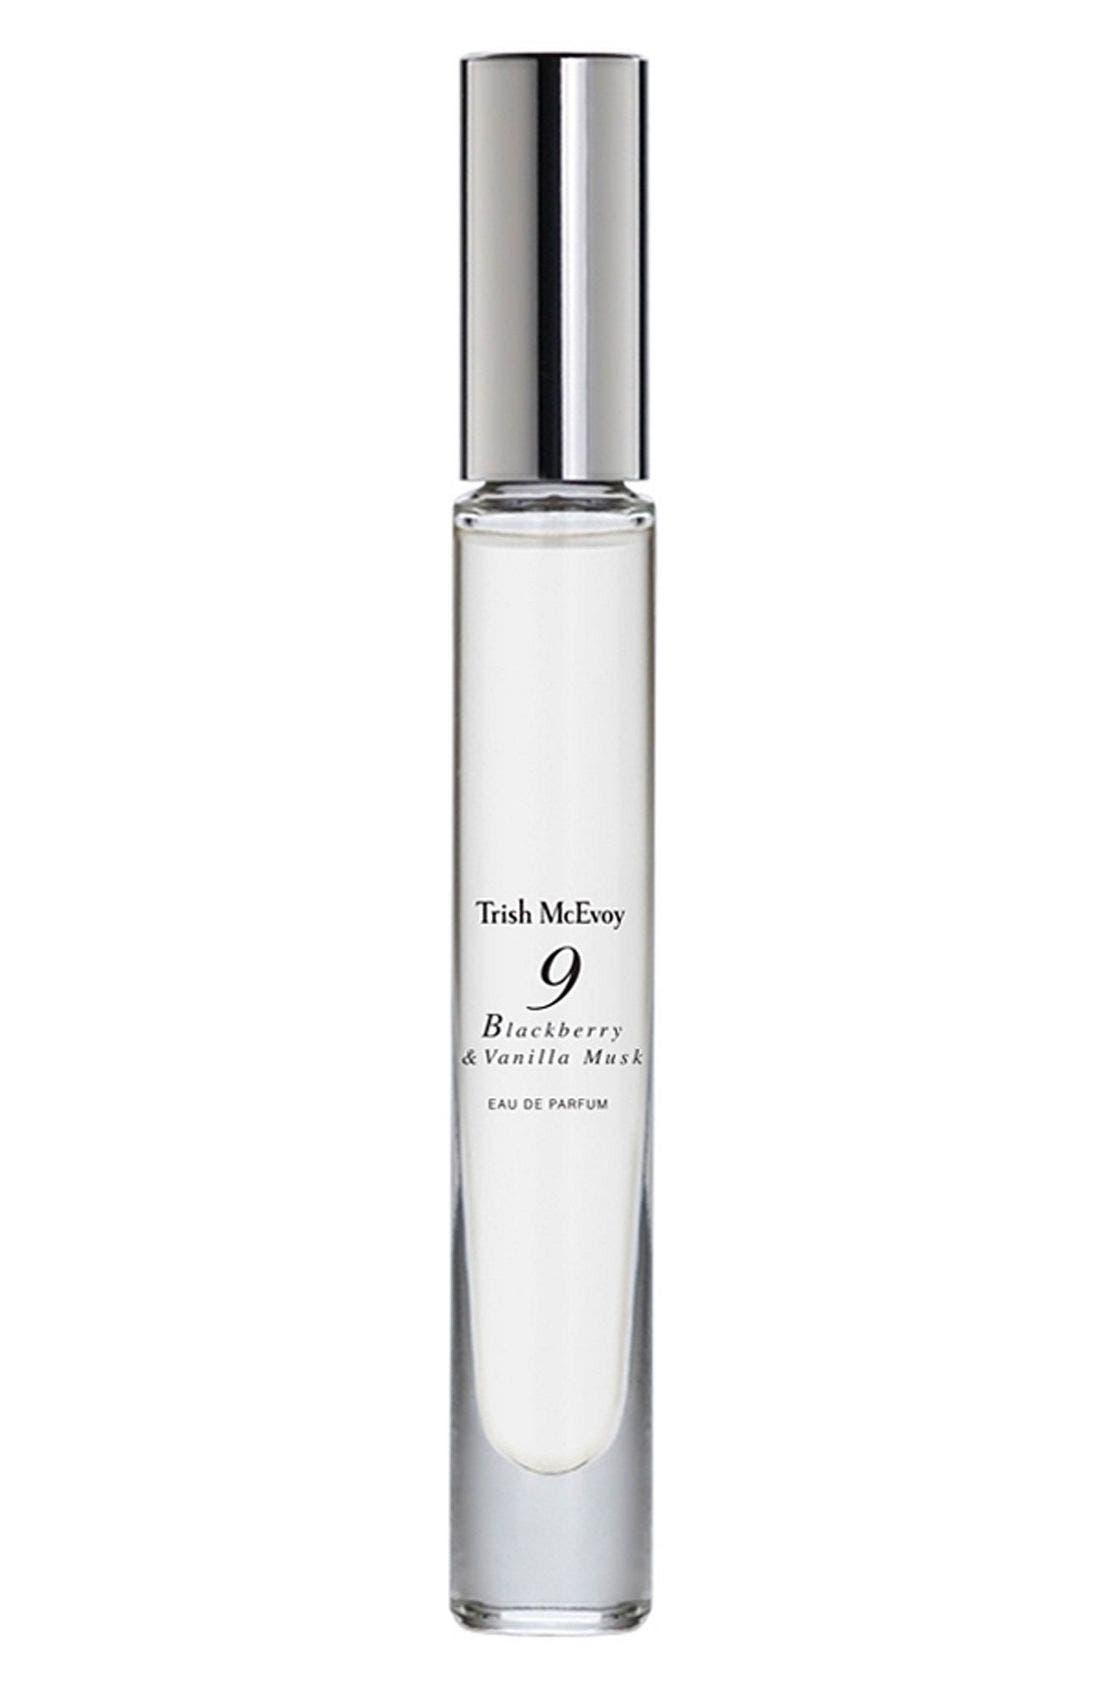 Trish McEvoy '9' Blackberry & Vanilla Musk Eau de Parfum Rollerball